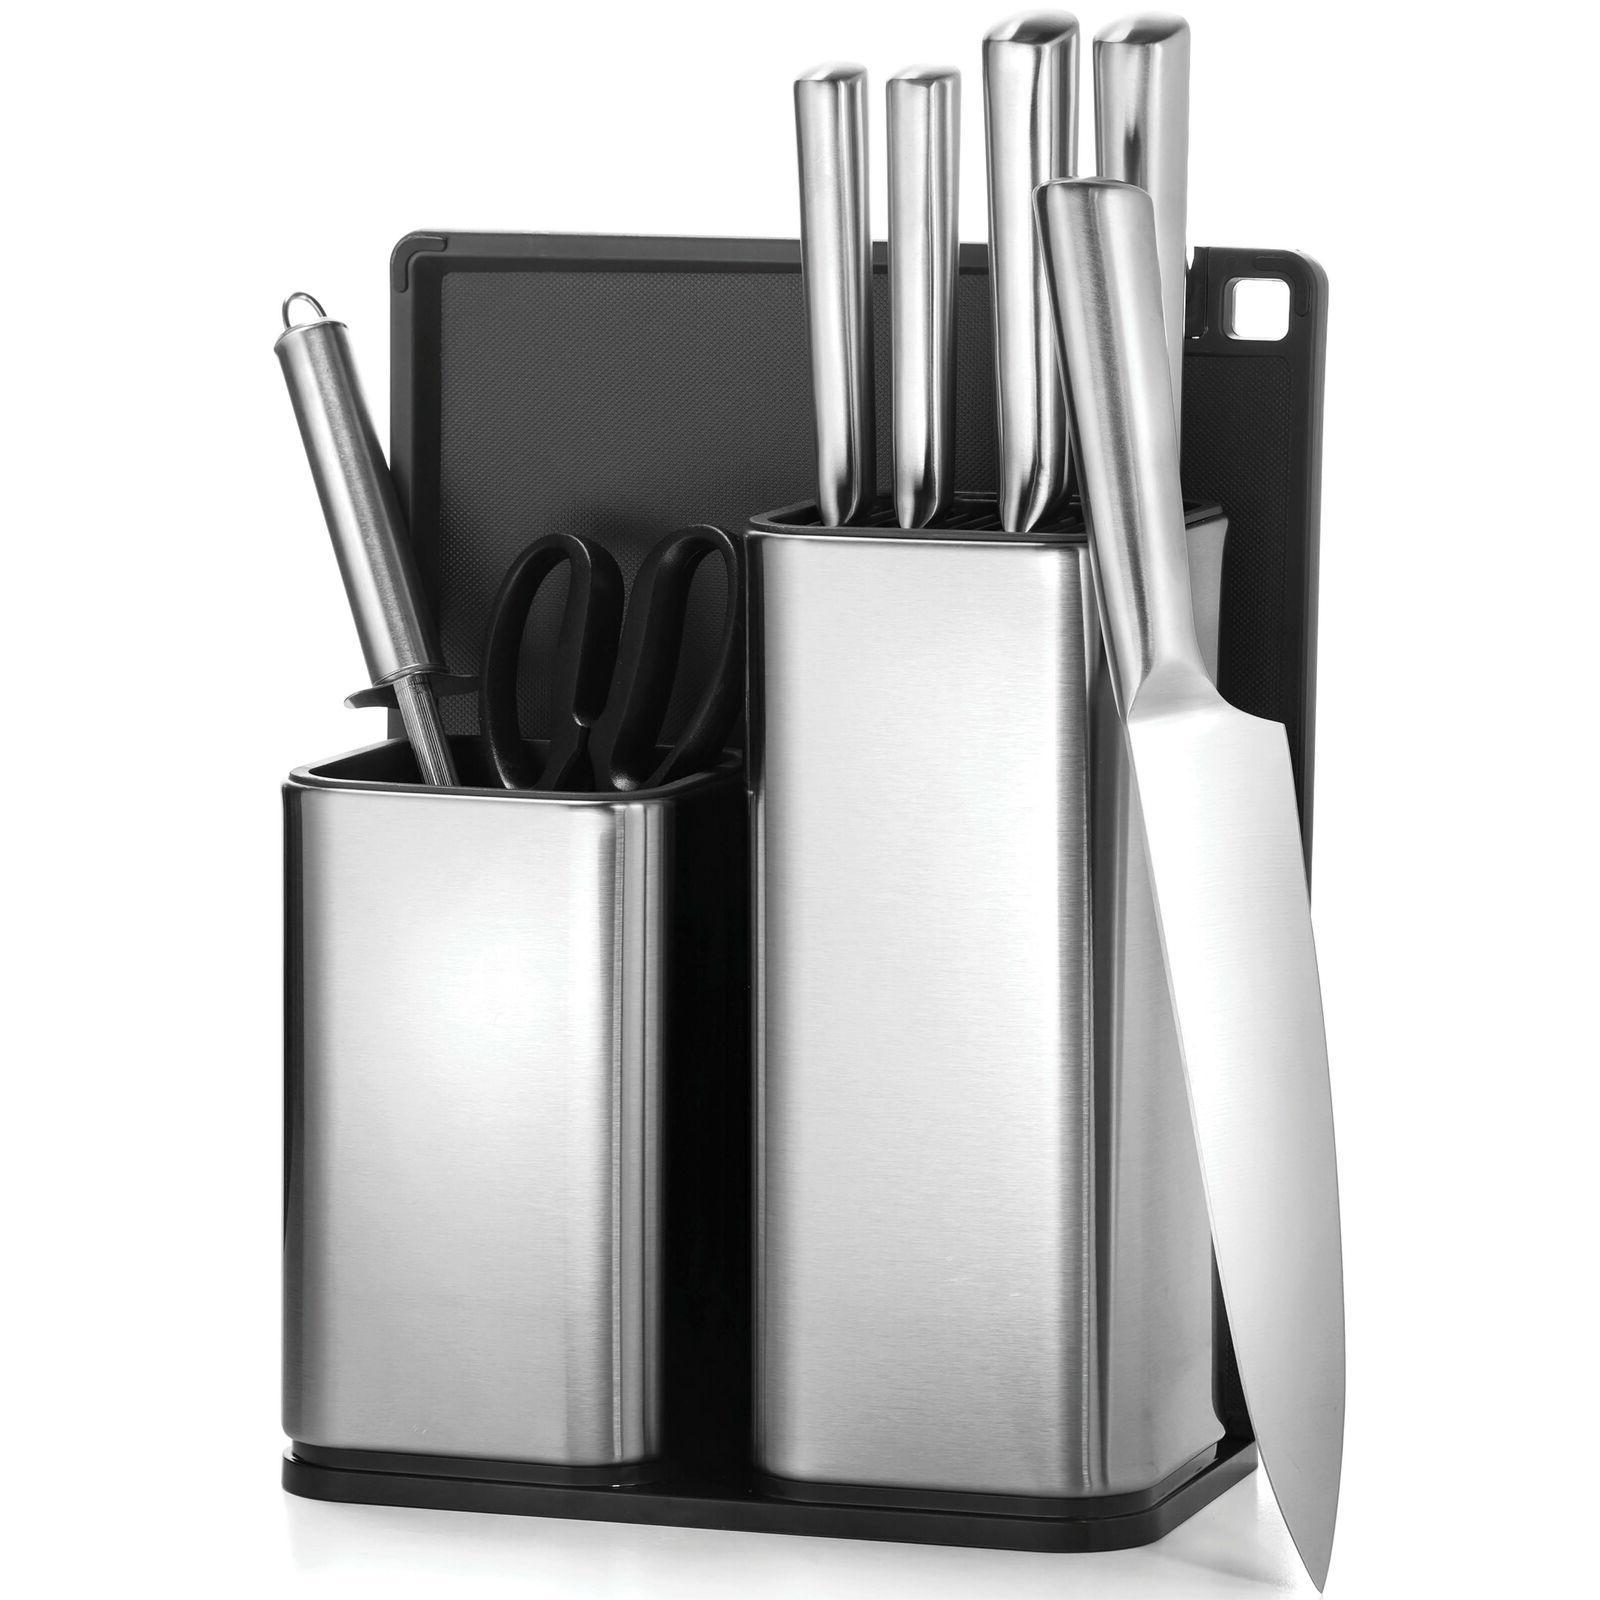 10 piece kitchen knife and utensil holder